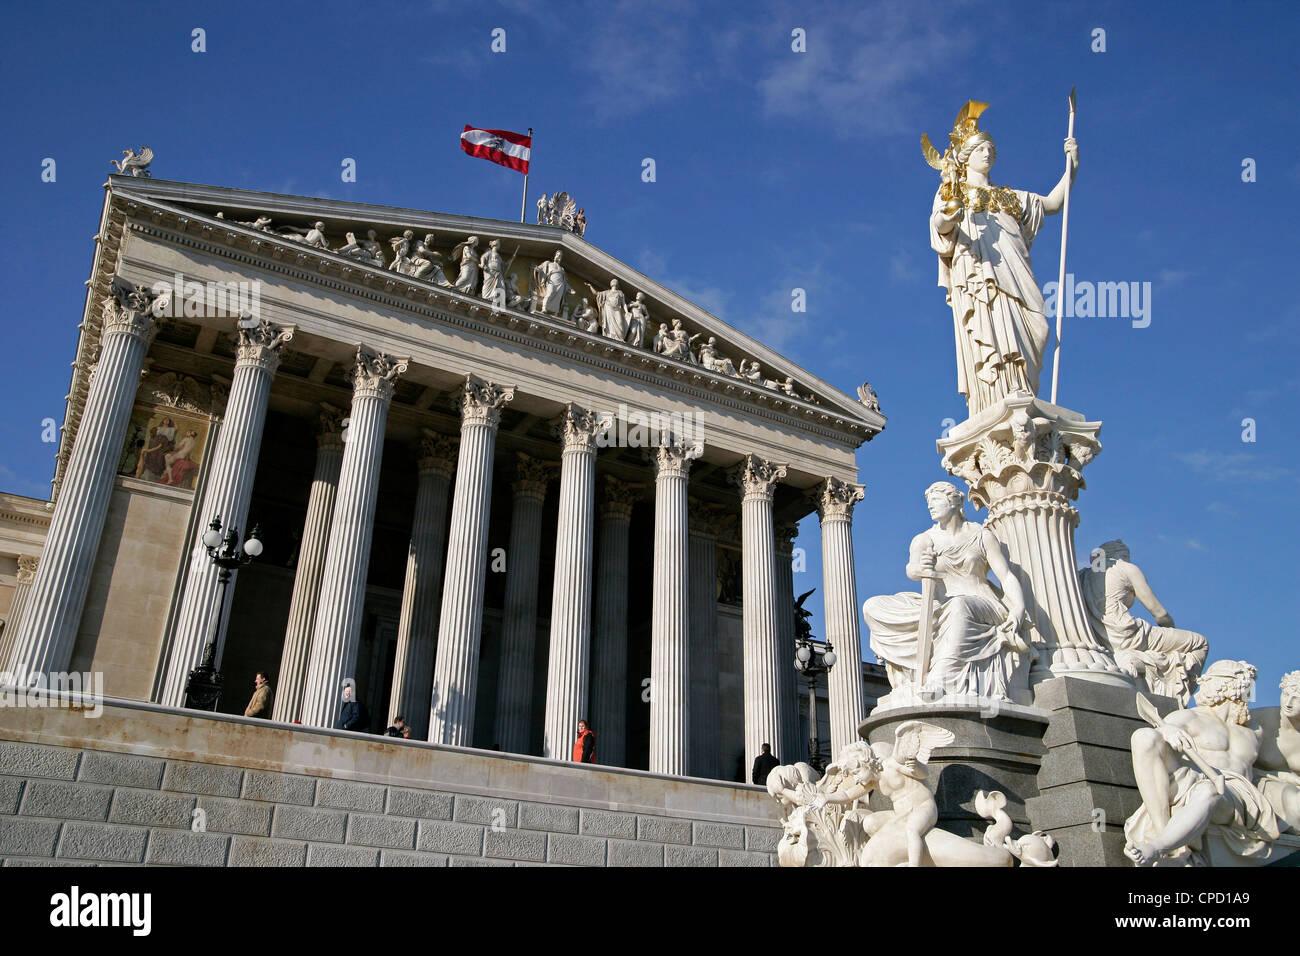 Parliament, Vienna, Austria, Europe - Stock Image